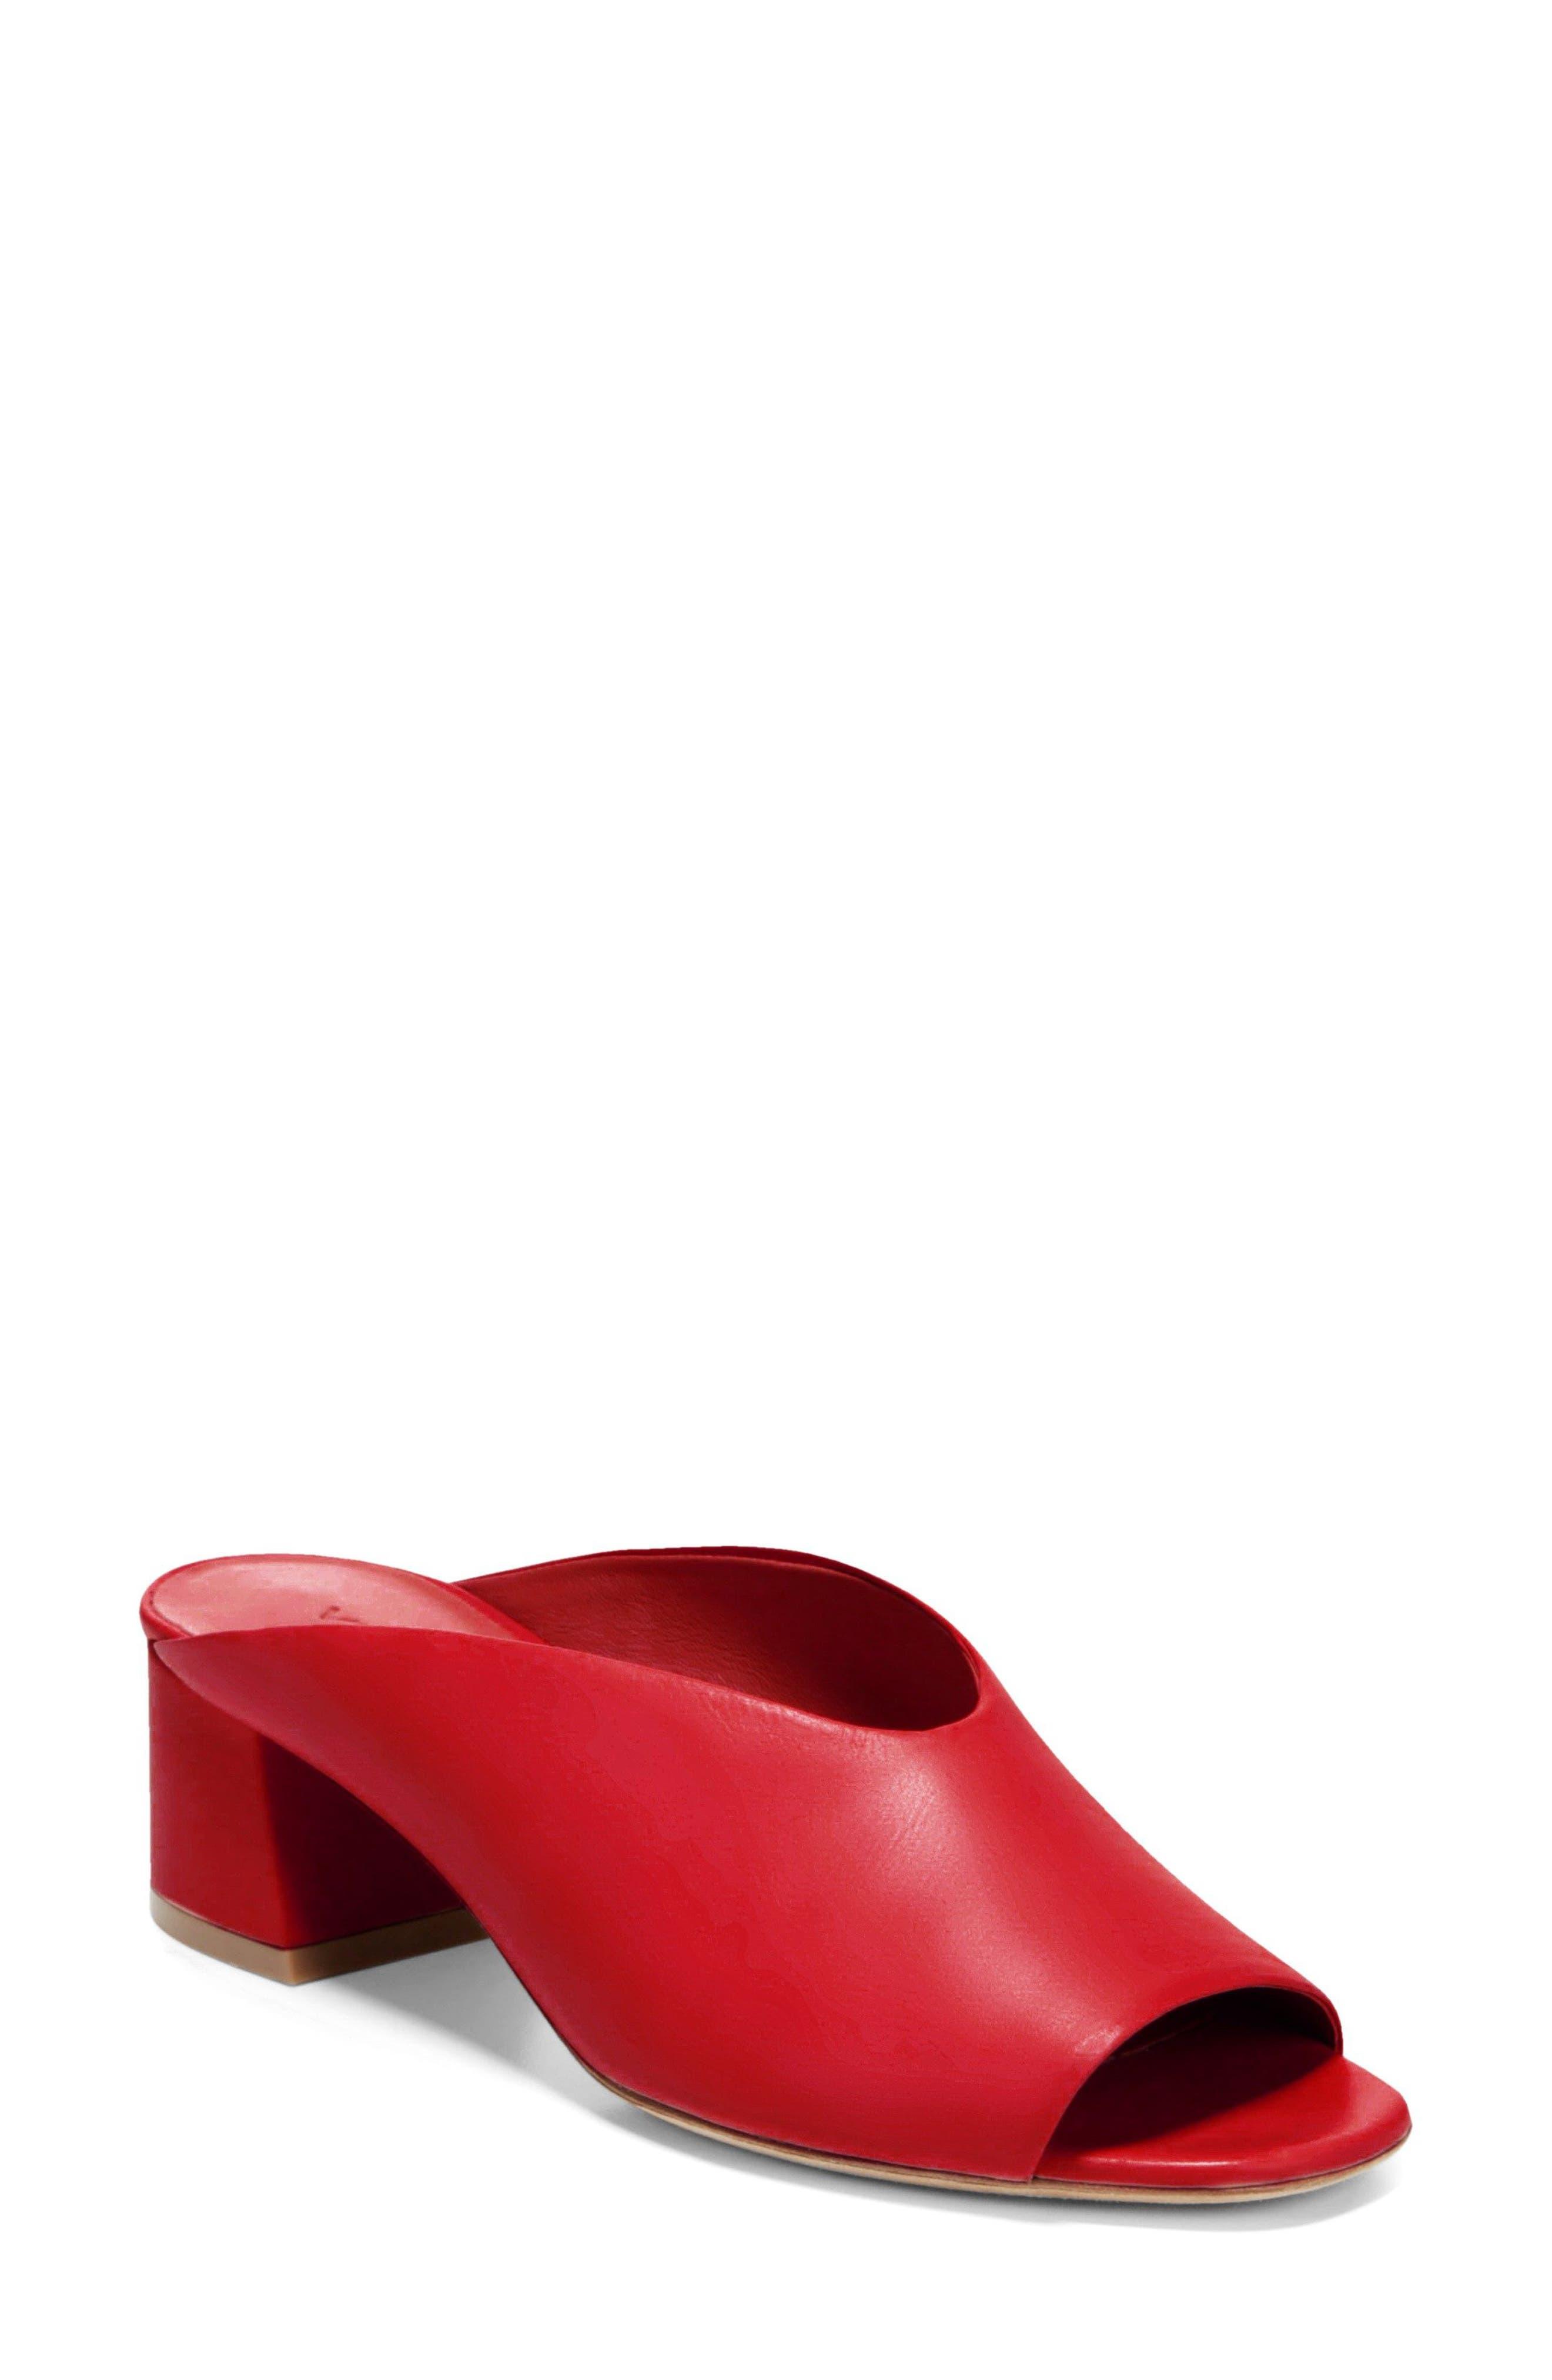 Cachet Sandal,                             Main thumbnail 1, color,                             Red